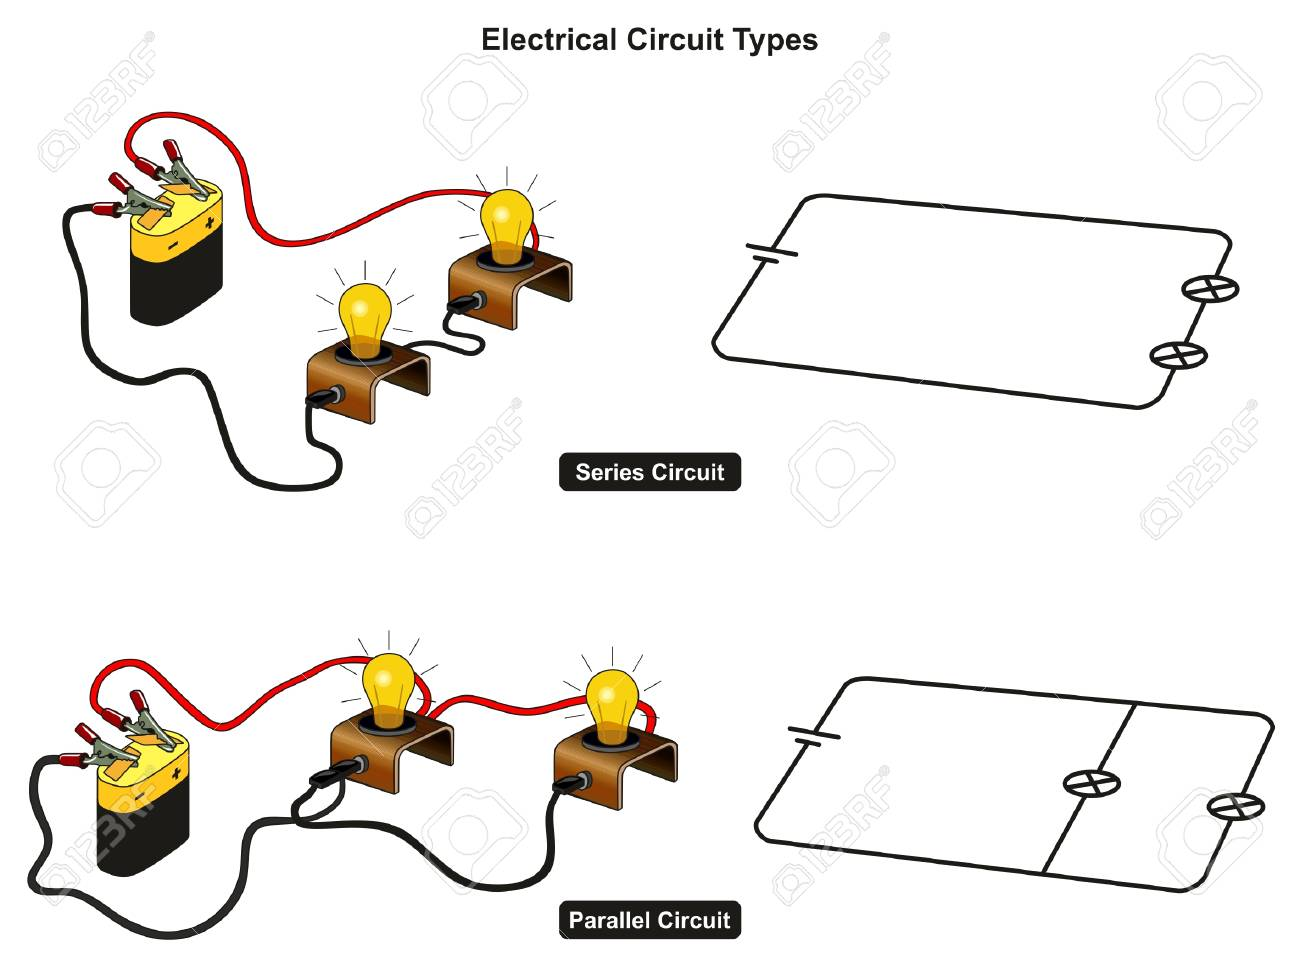 Circuito Paralelo : Tipos de circuitos eléctricos diagrama infográfico que muestra